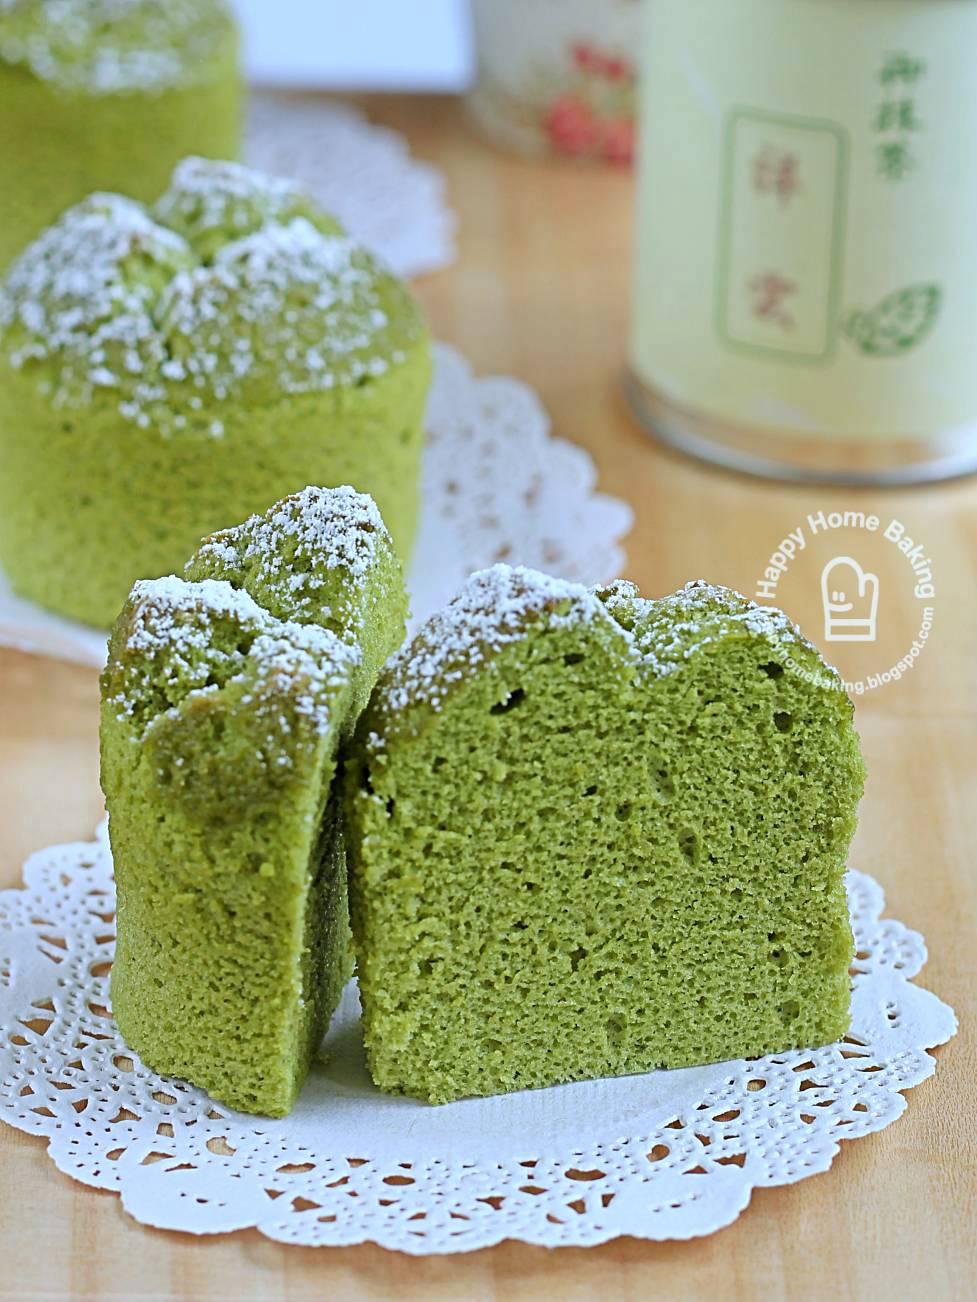 Extra Light Chiffon Cake Recipe